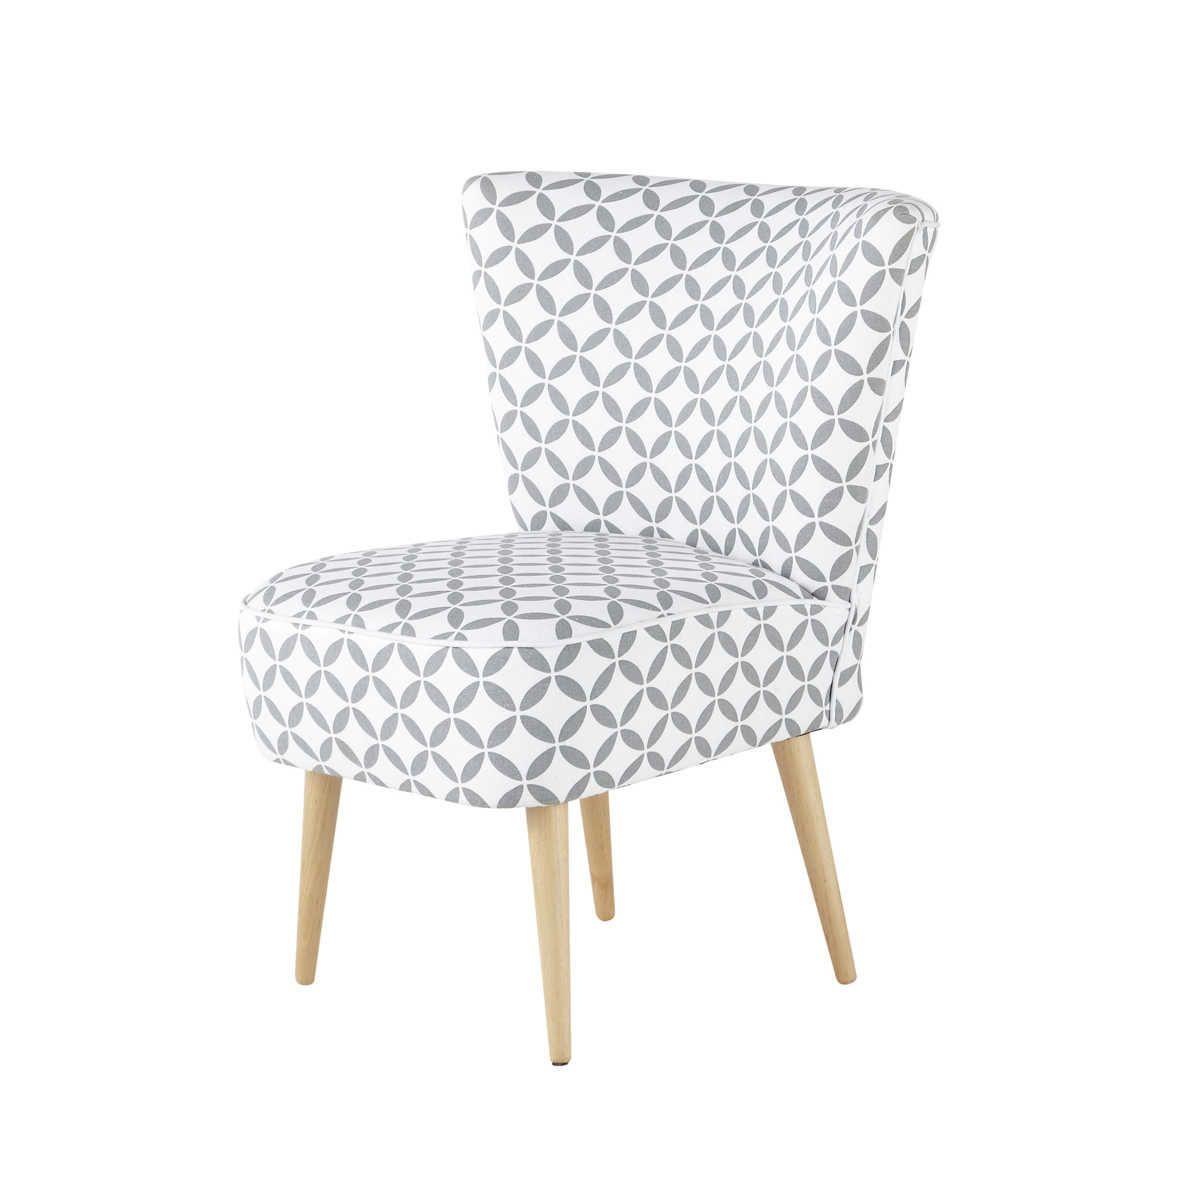 Fauteuil style scandinave pas cher for Petite table scandinave pas cher